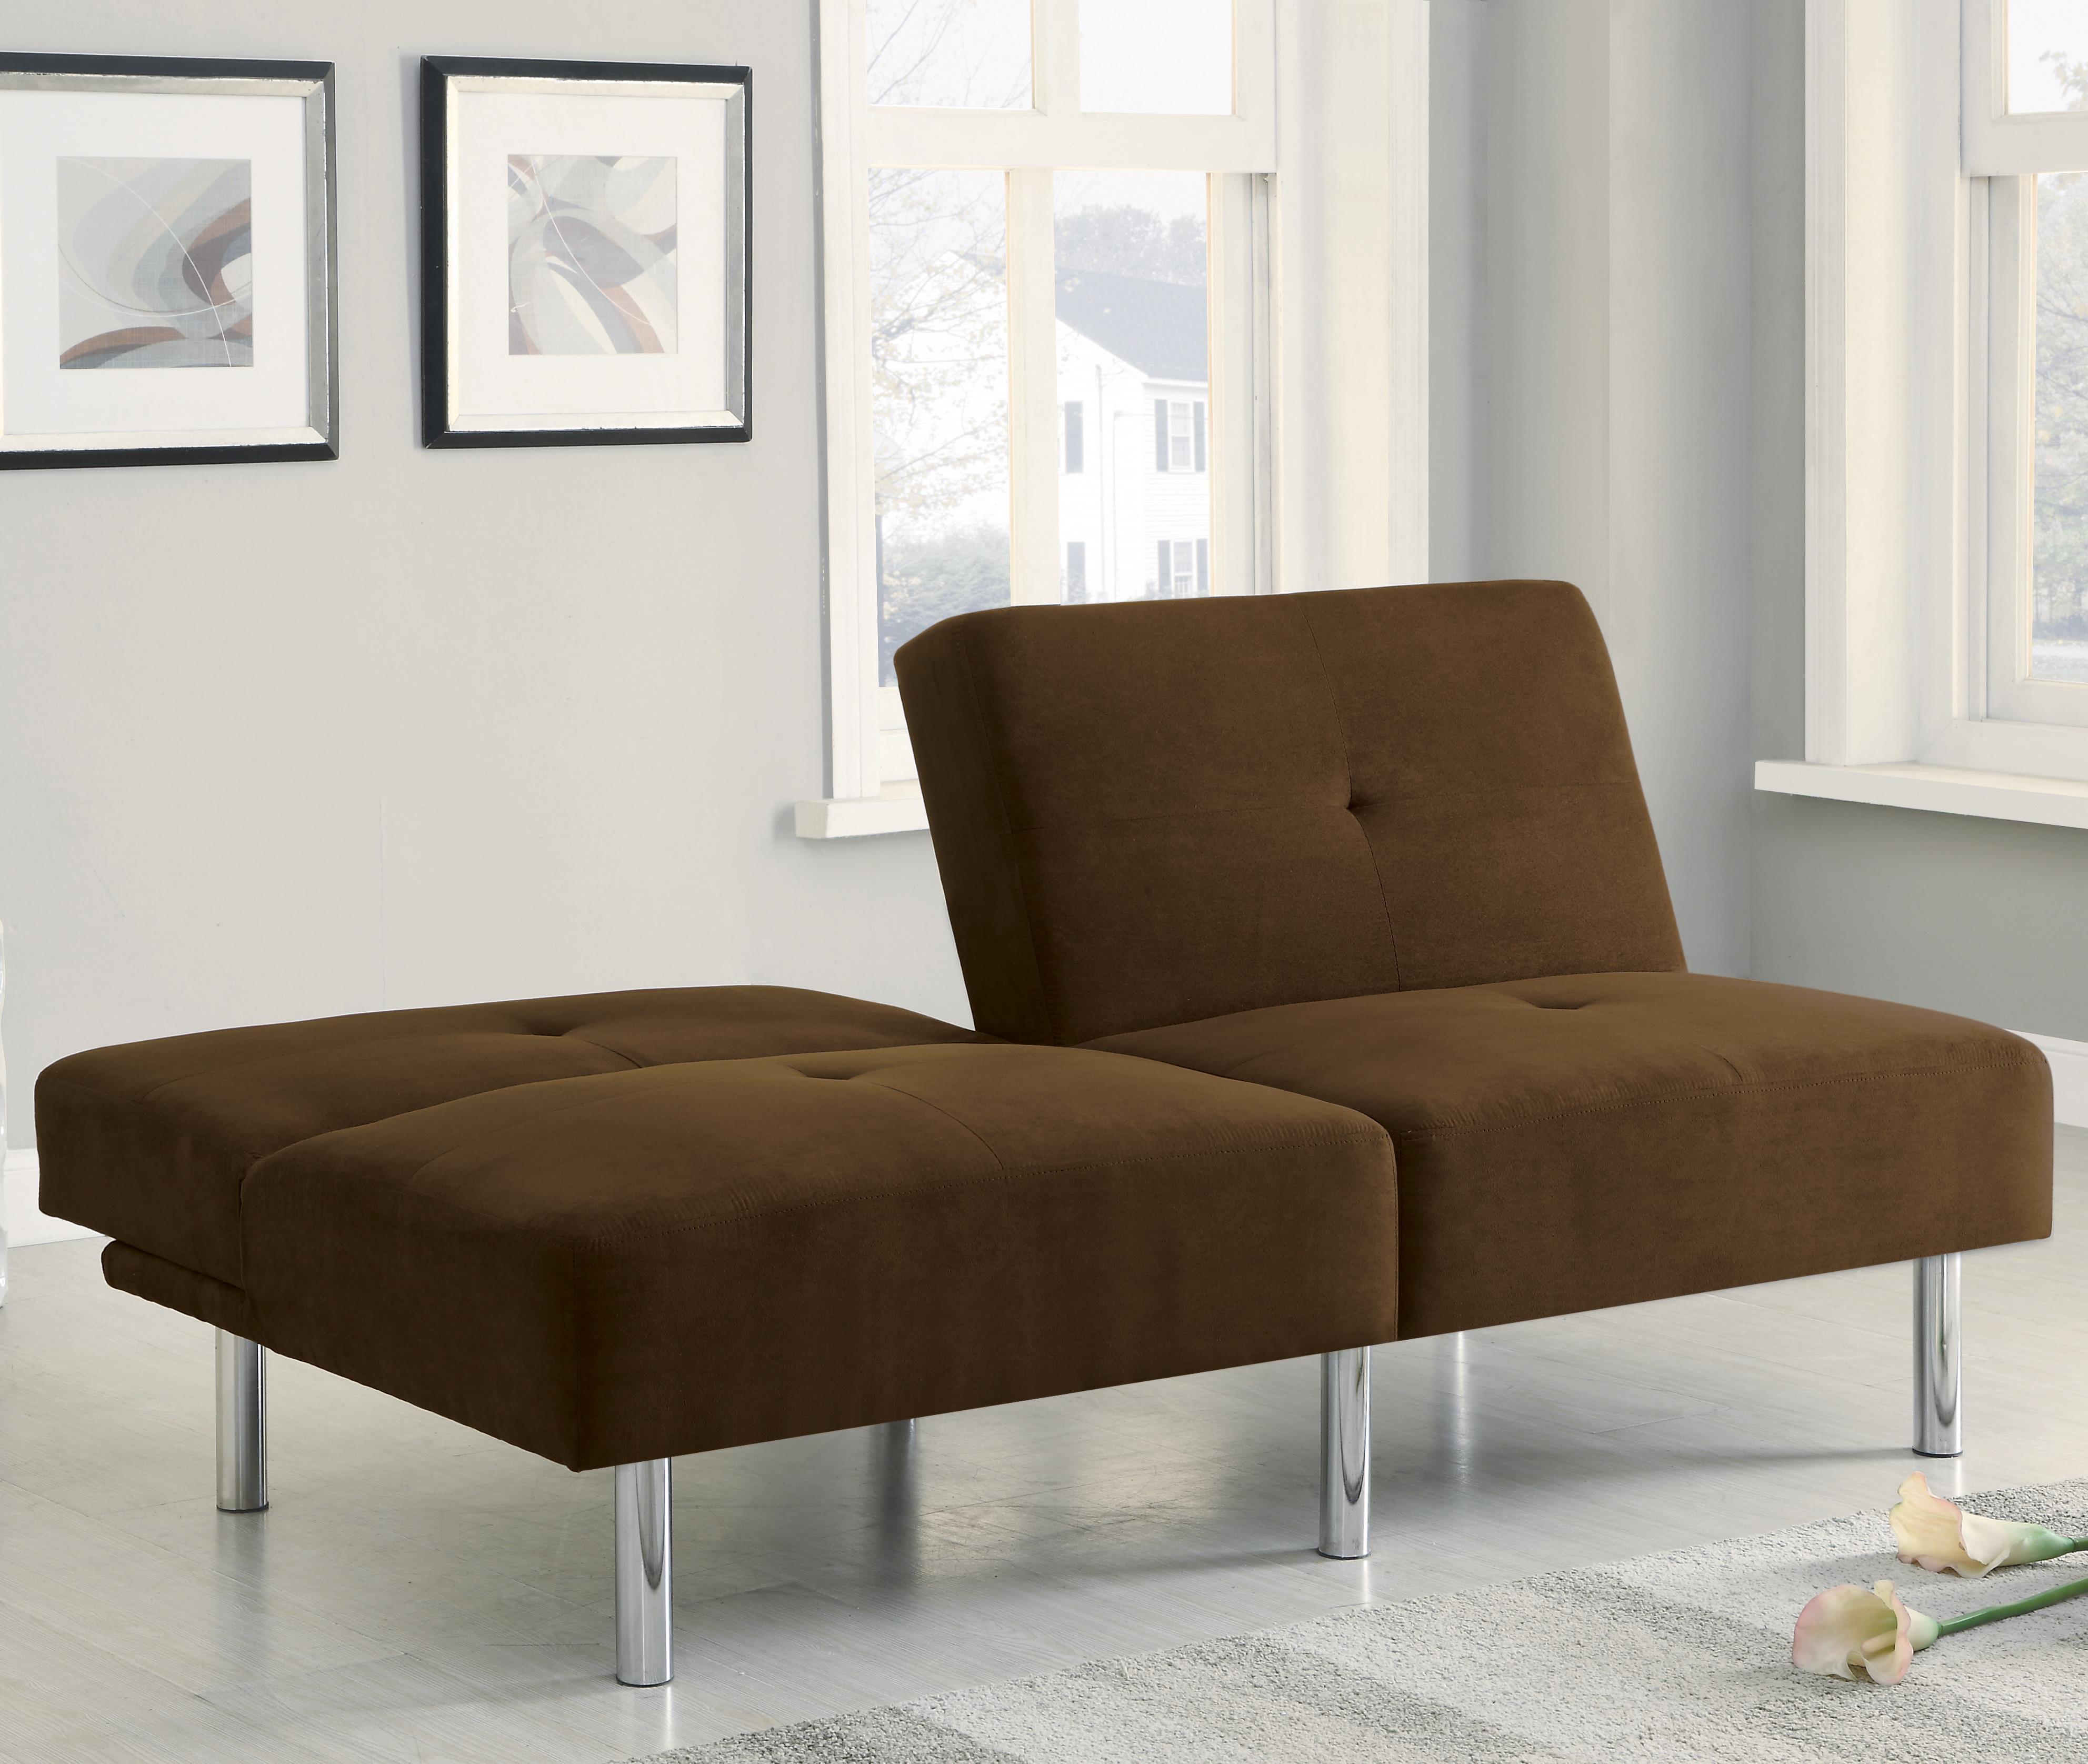 Contemporary Futon Sofa Bed: Contemporary Microfiber Sofa Bed